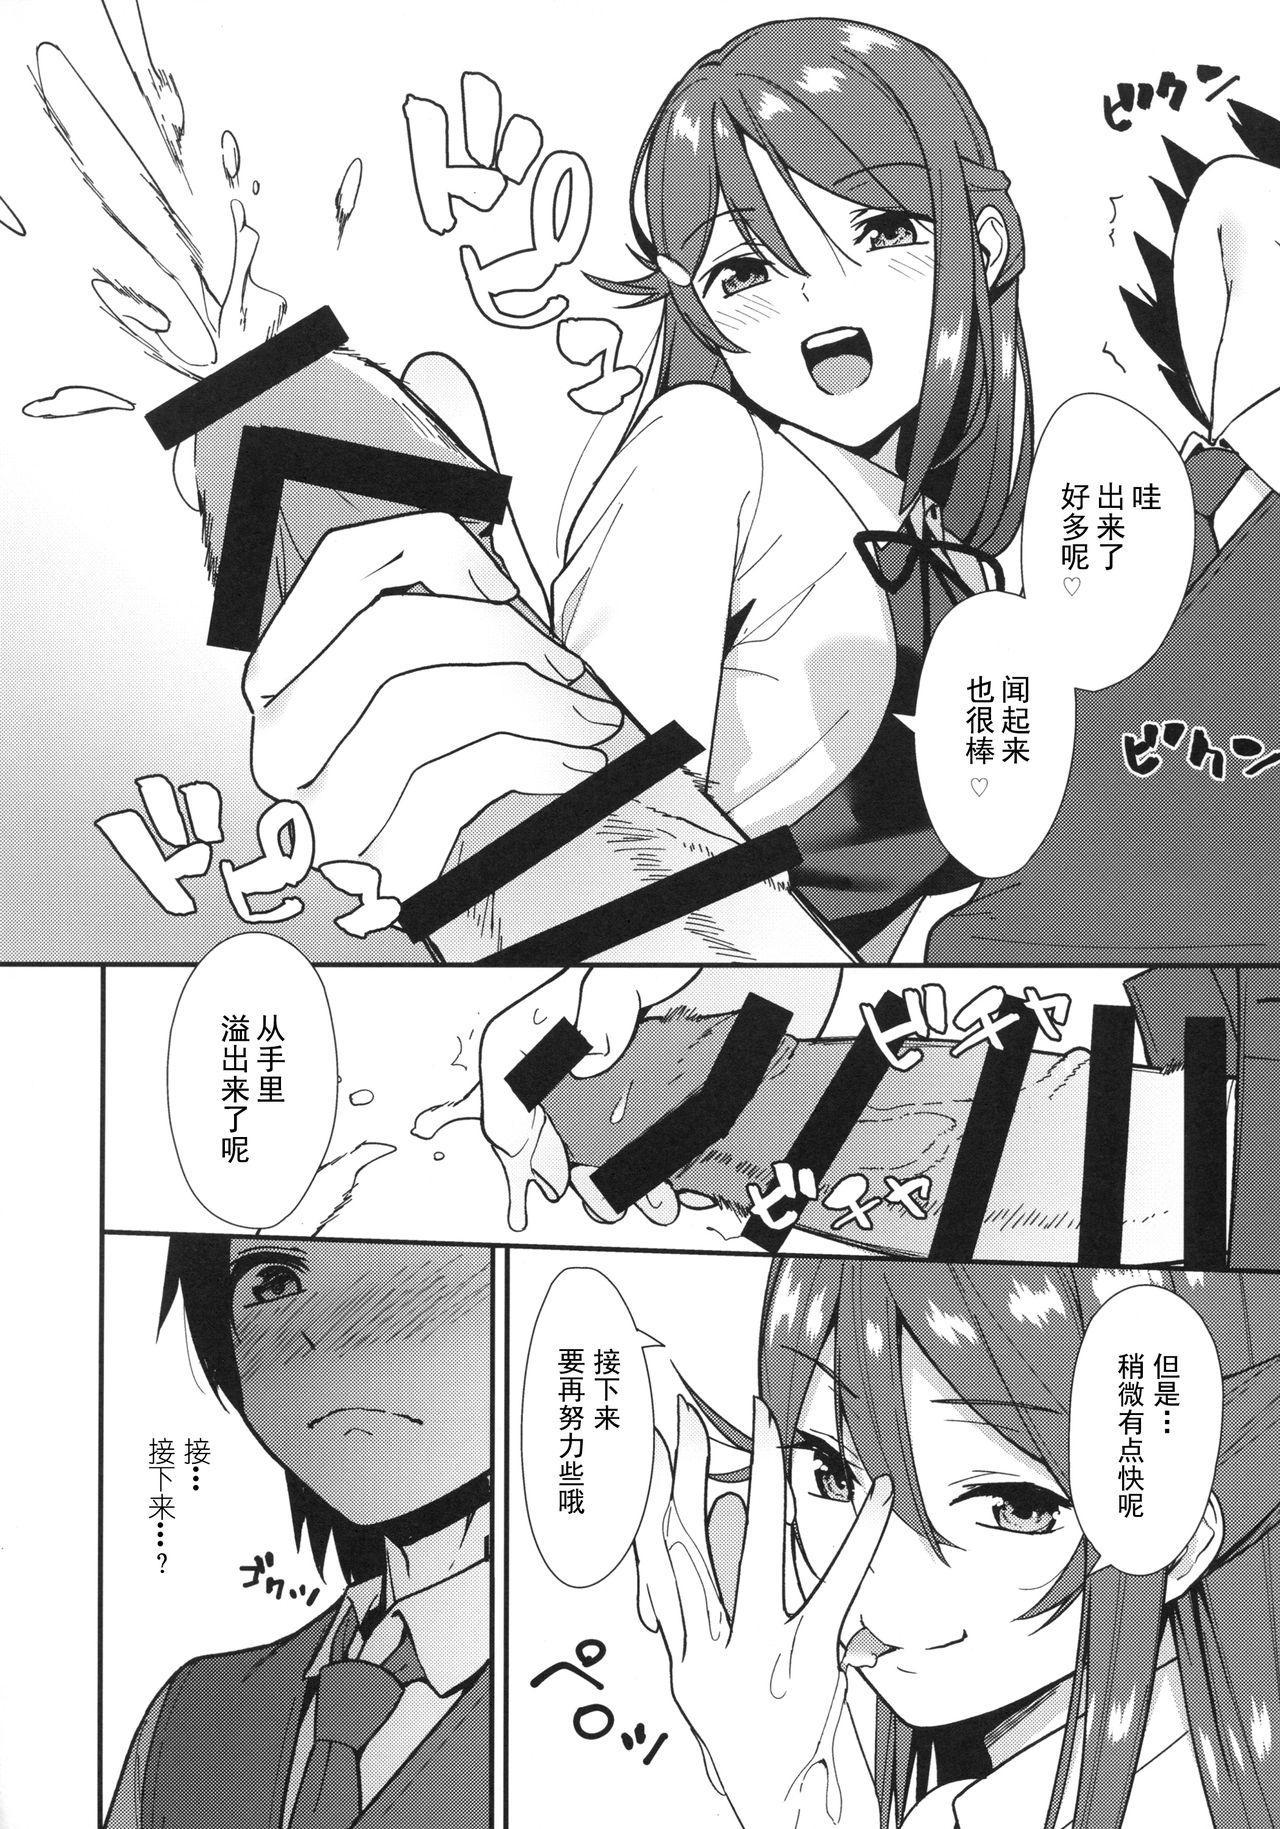 Kyou kara Hajimaru Sex Life - Start in my brand new SEX life. 8